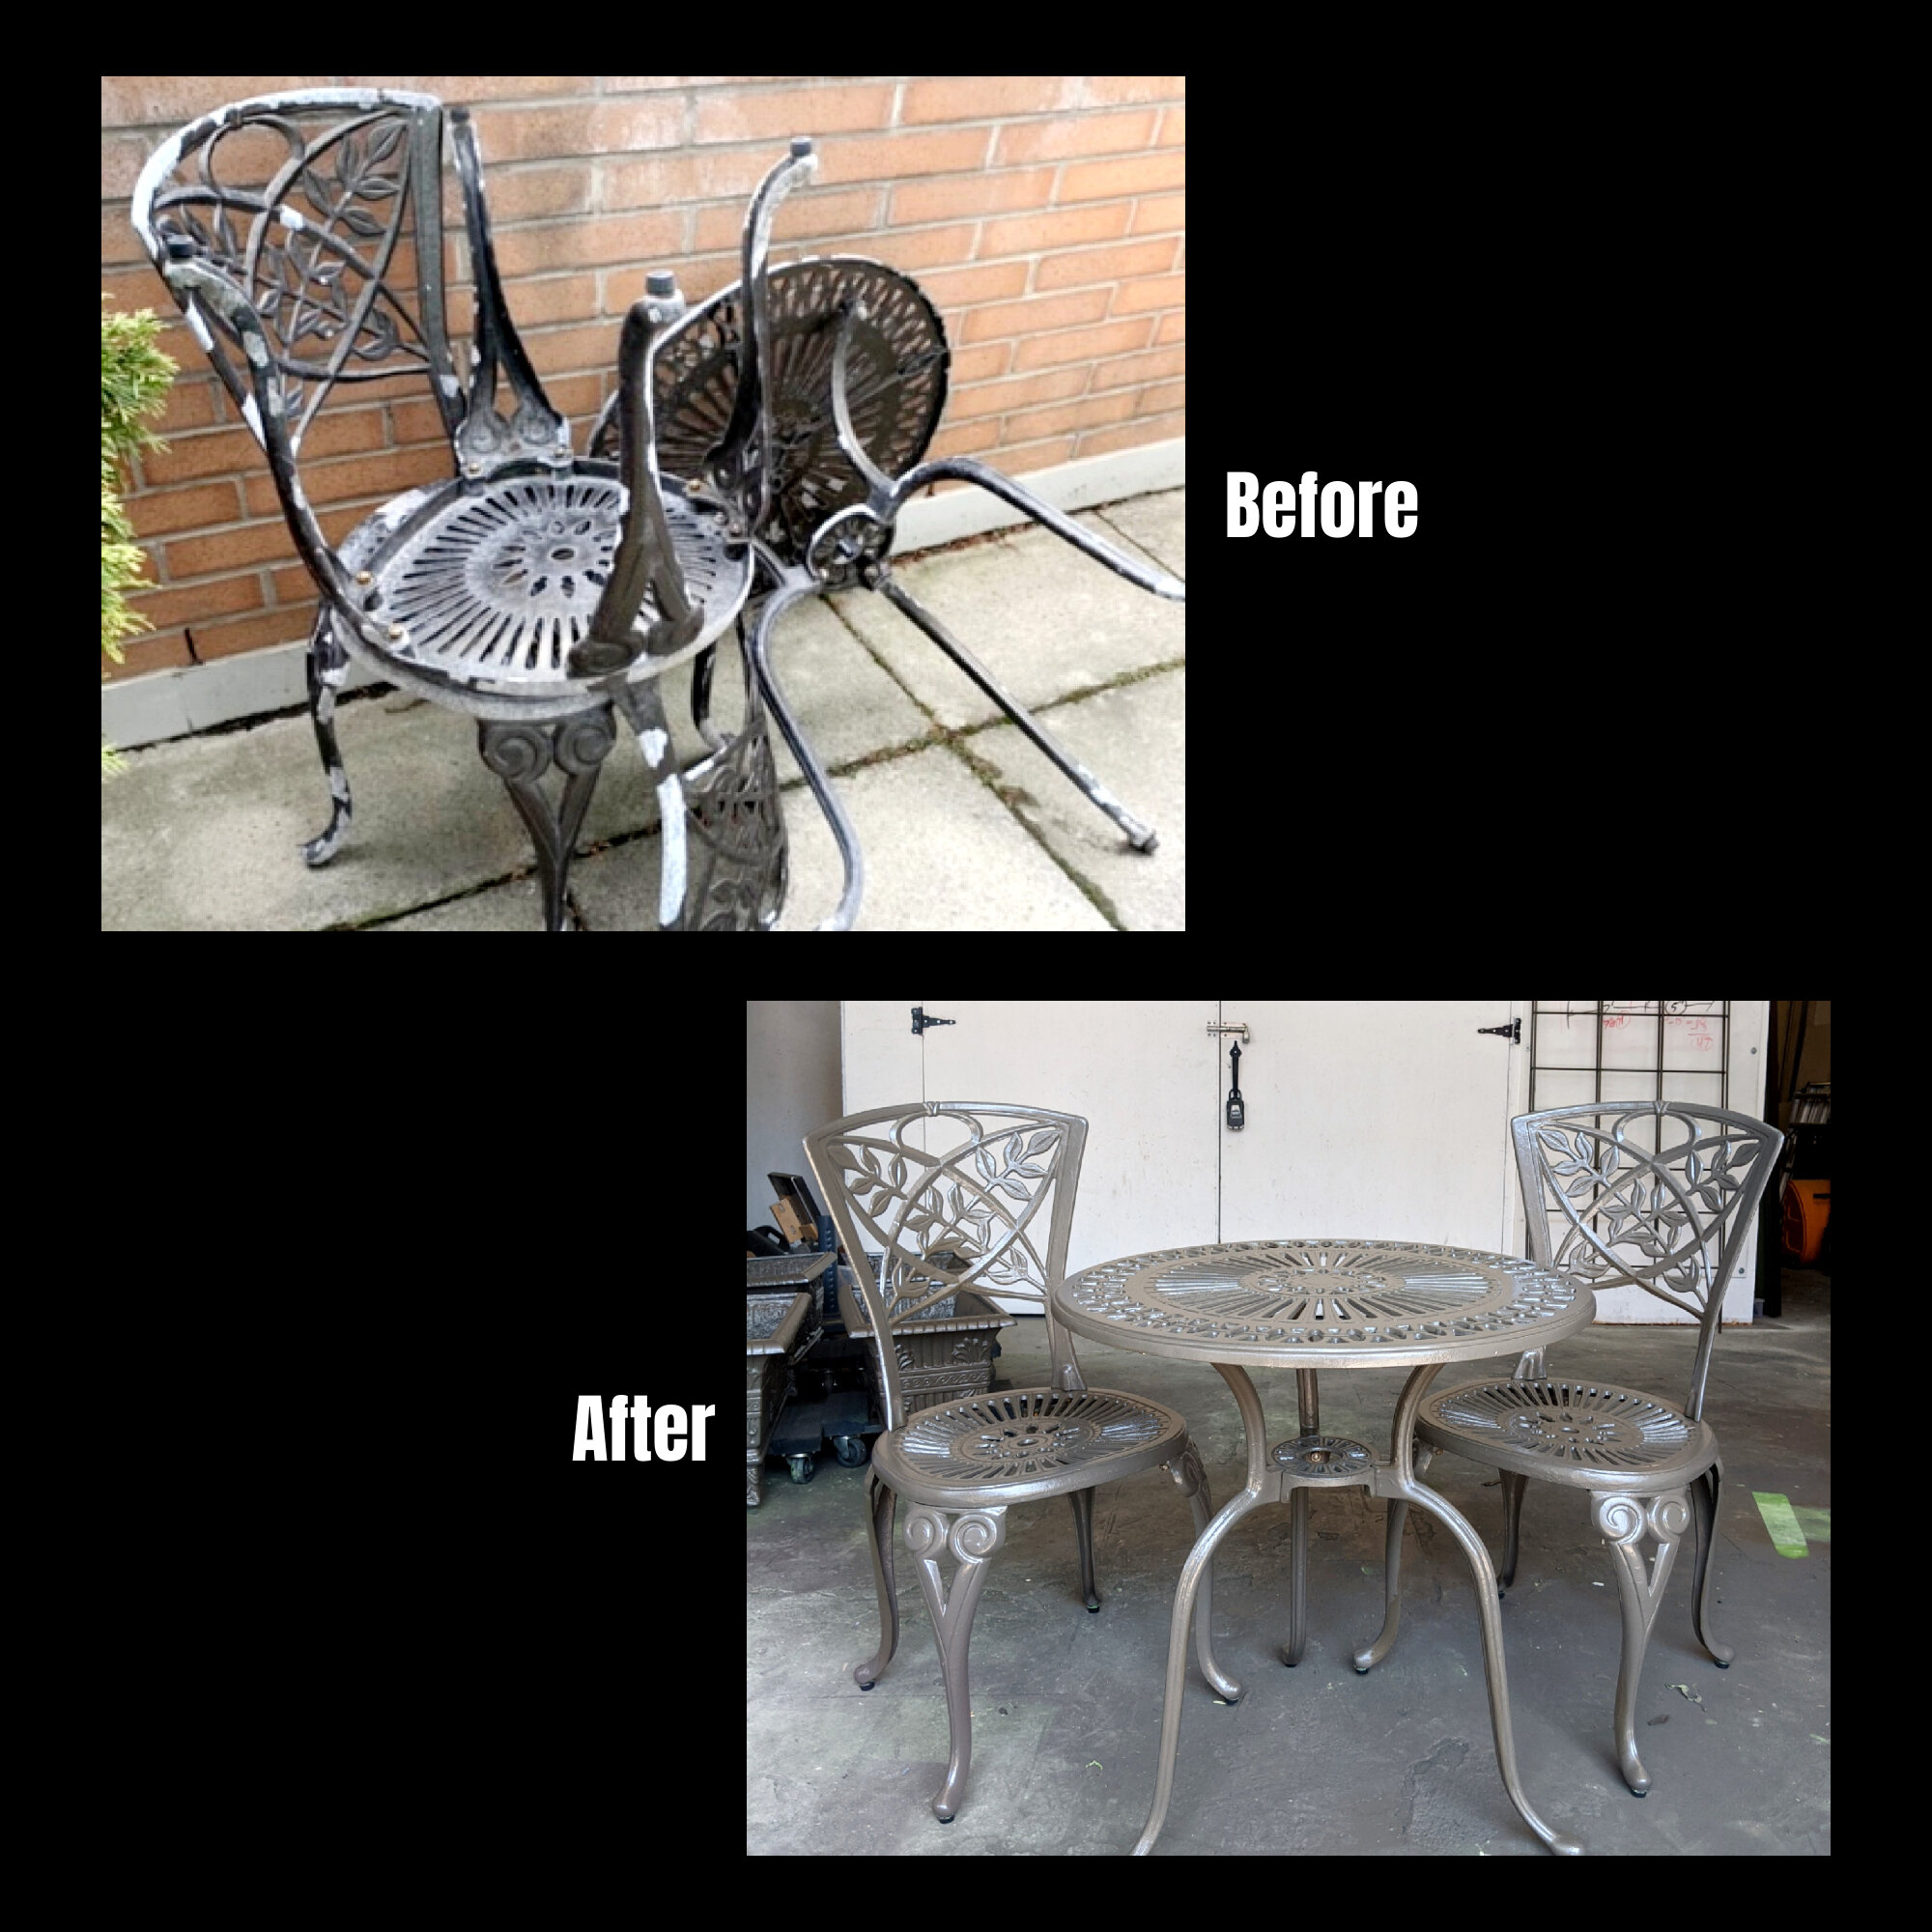 Patio Furniture Refinishing — Fix-It Friend  Handyman Services in